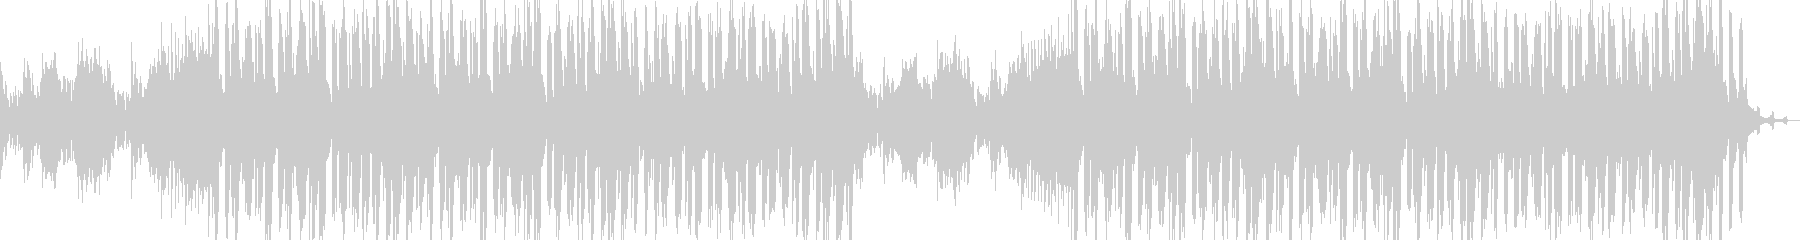 Koto Main: A quiet and modern BGM's unreproduced waveform